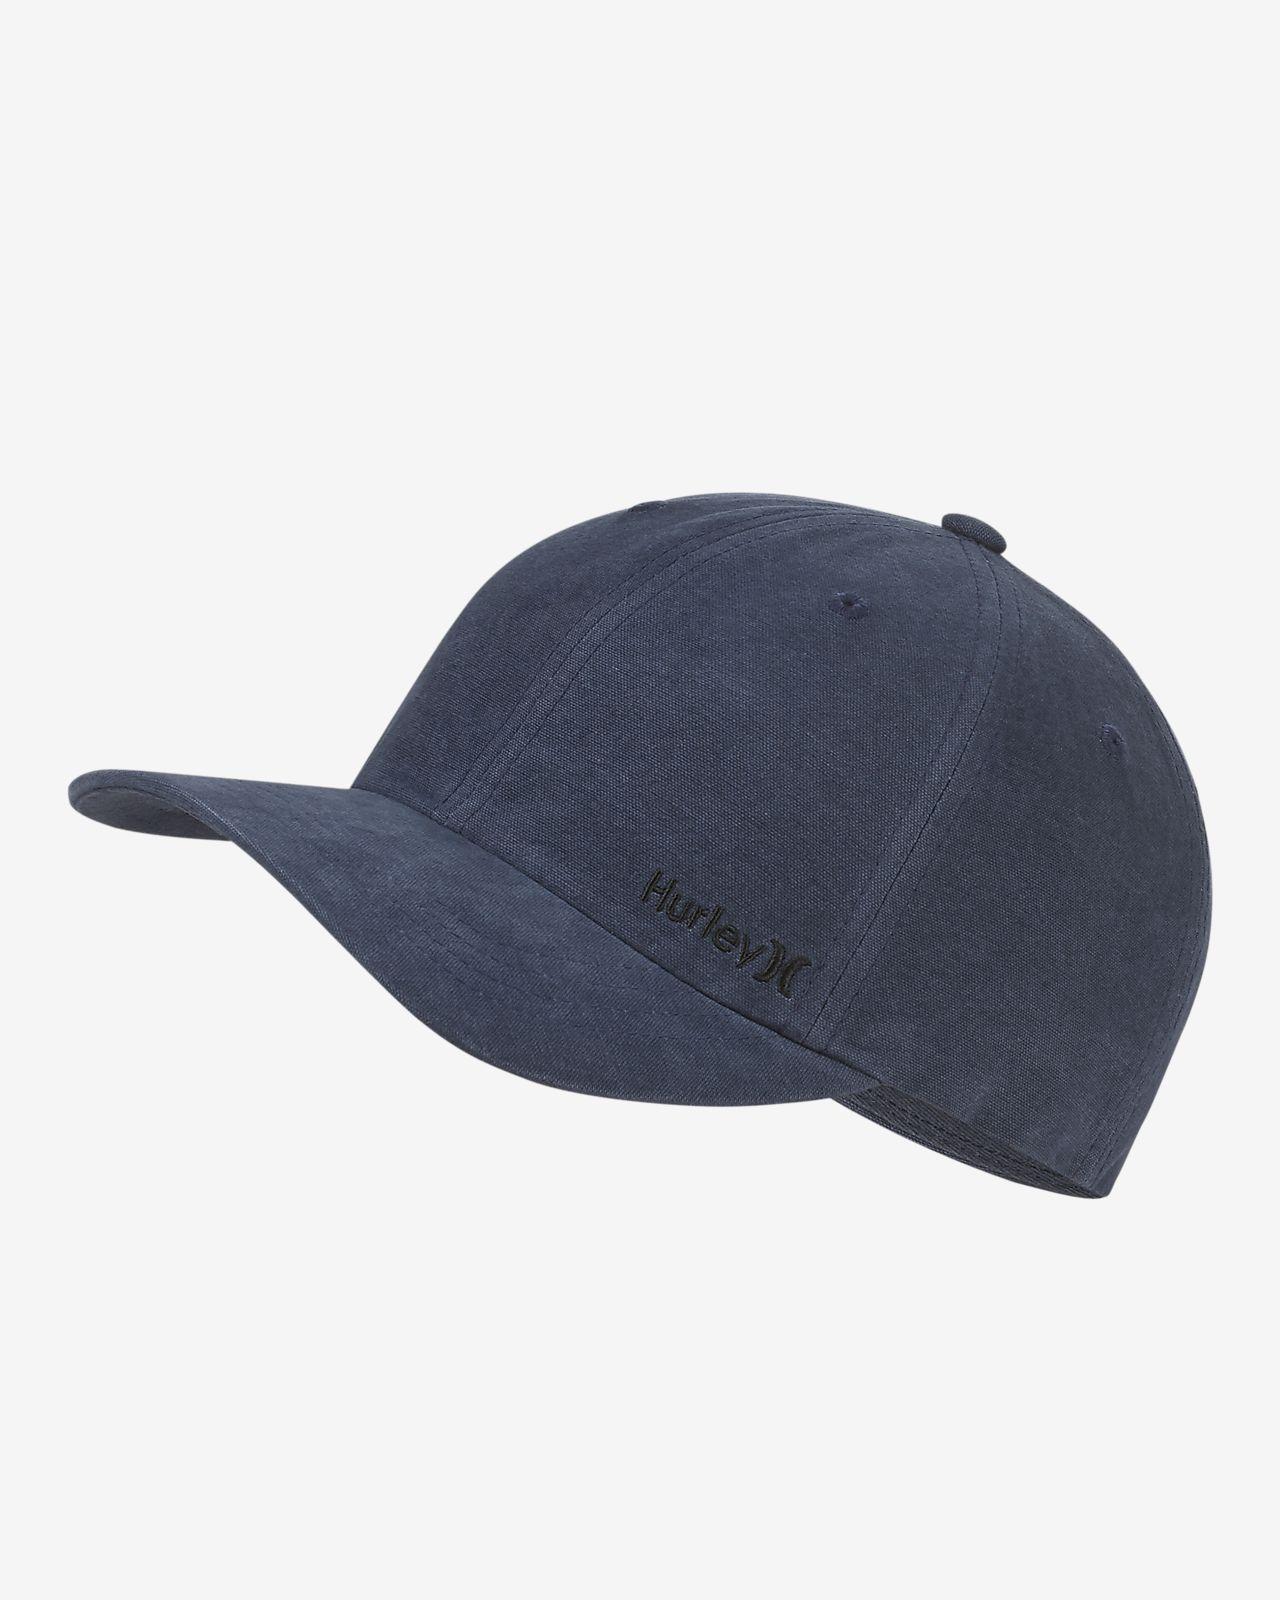 Cappello Hurley Andy - Uomo